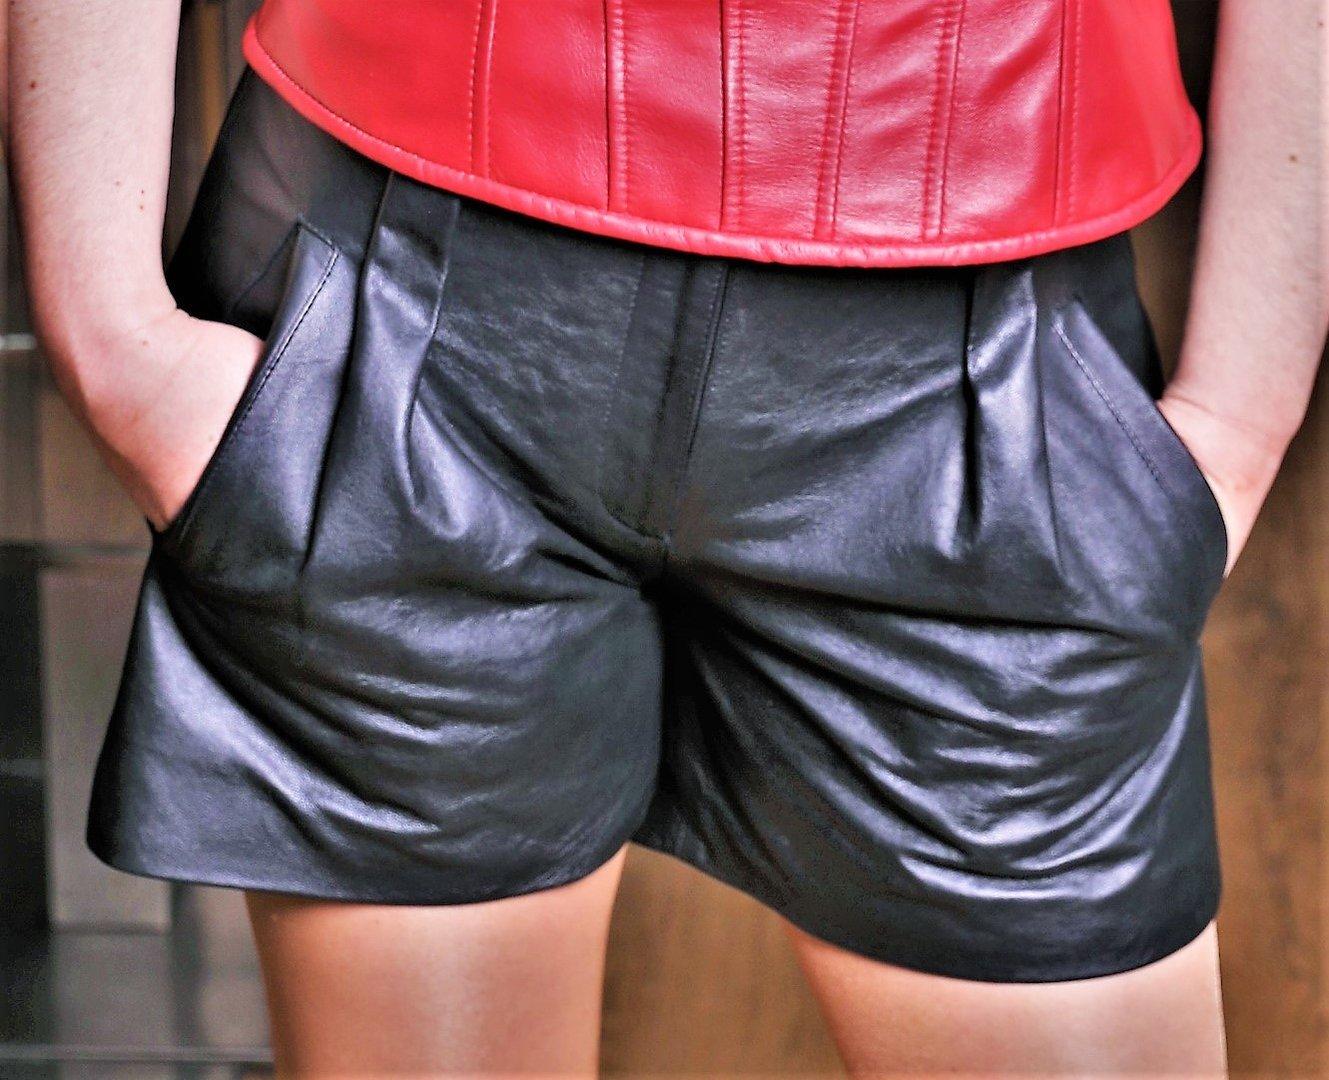 Leder-Short Hot-Pants in ECHT-LEDER im ELEGANTEN Style für